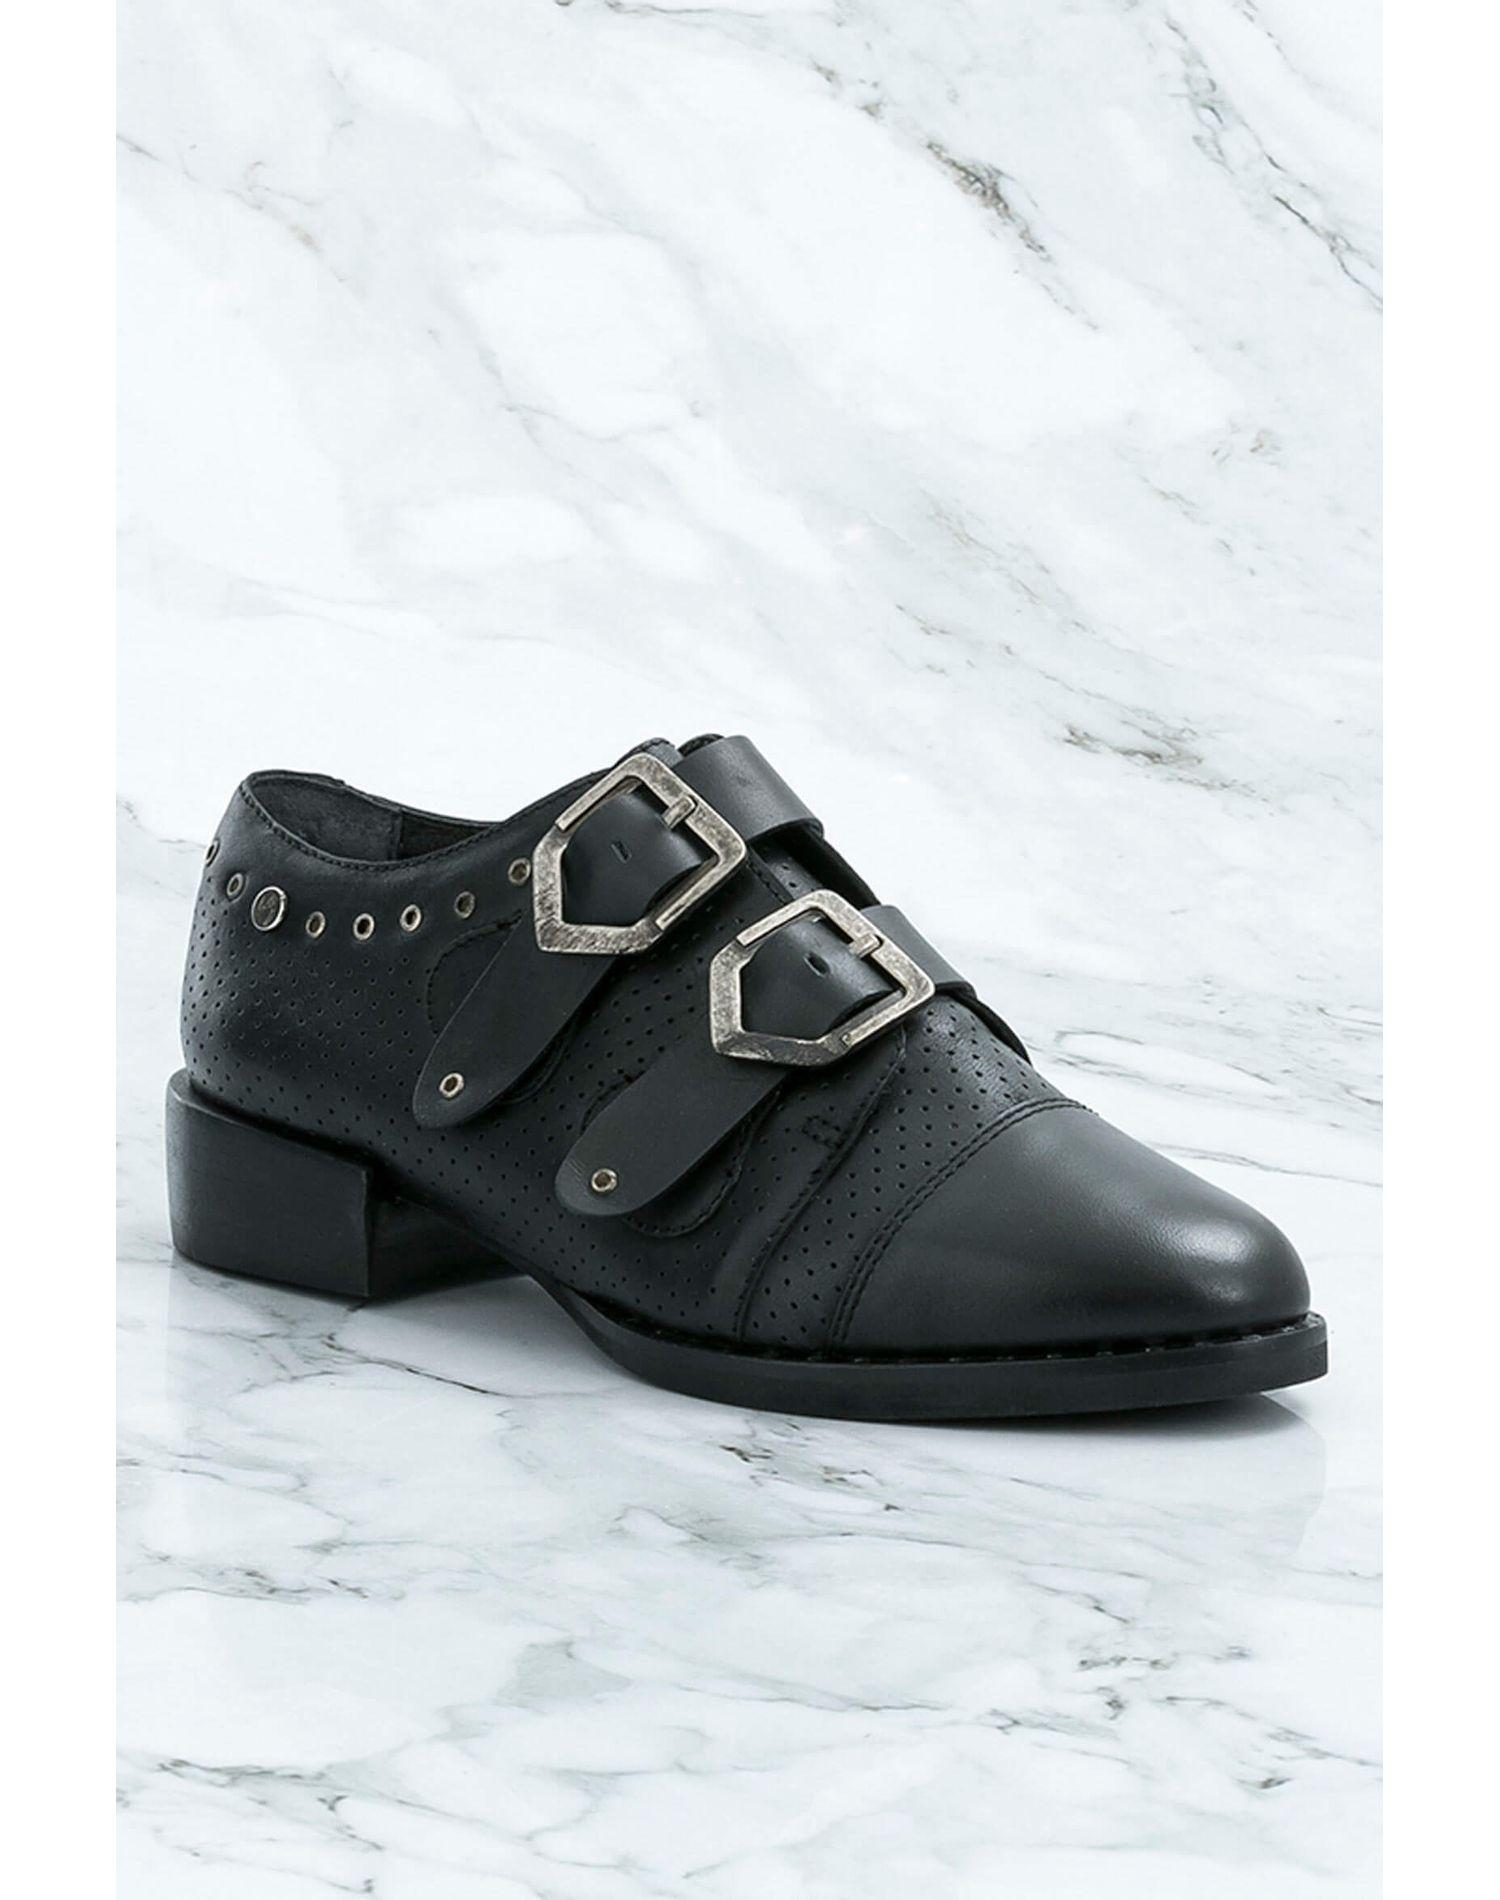 Zapatos de cuero con cordón para mujer 13508  ba532a53c8a8d